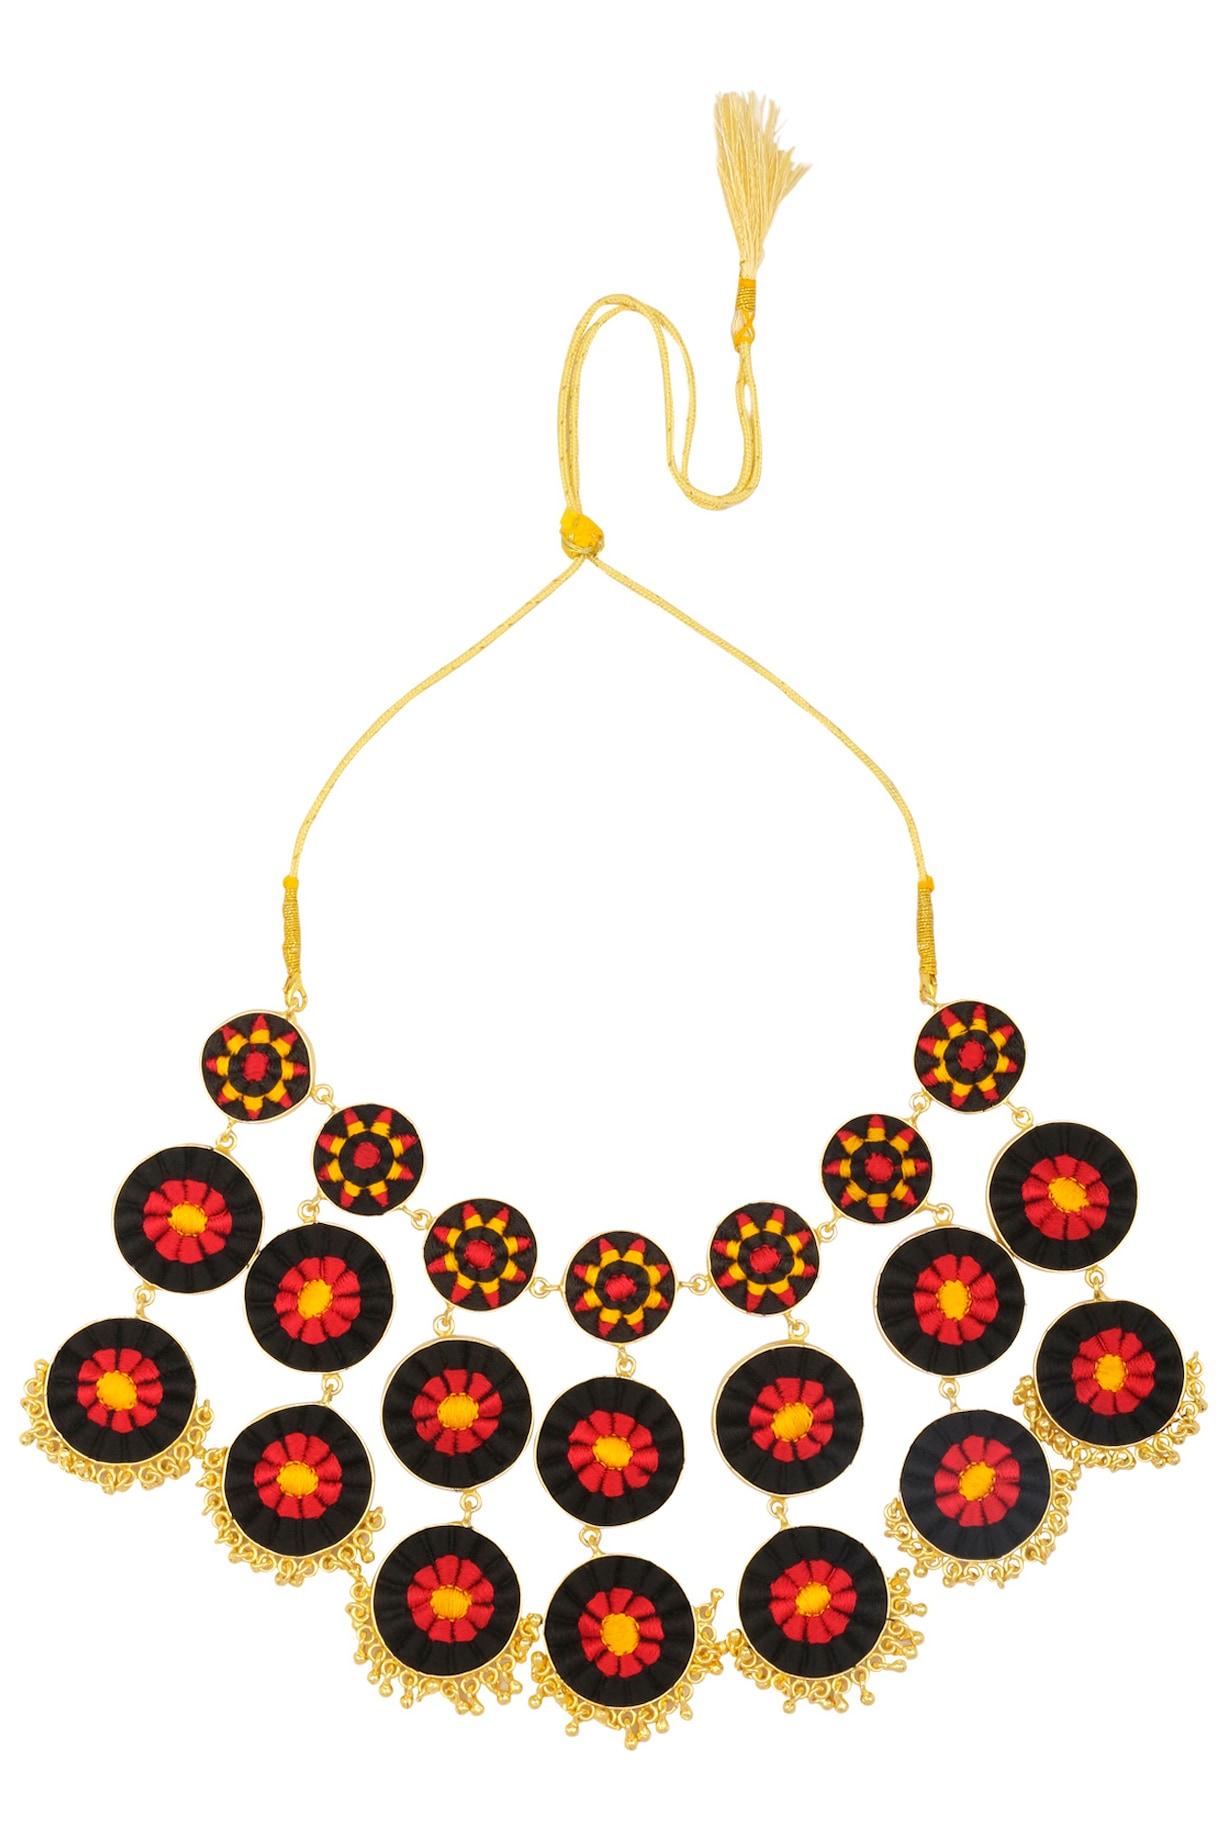 Bauble Bazaar Necklaces